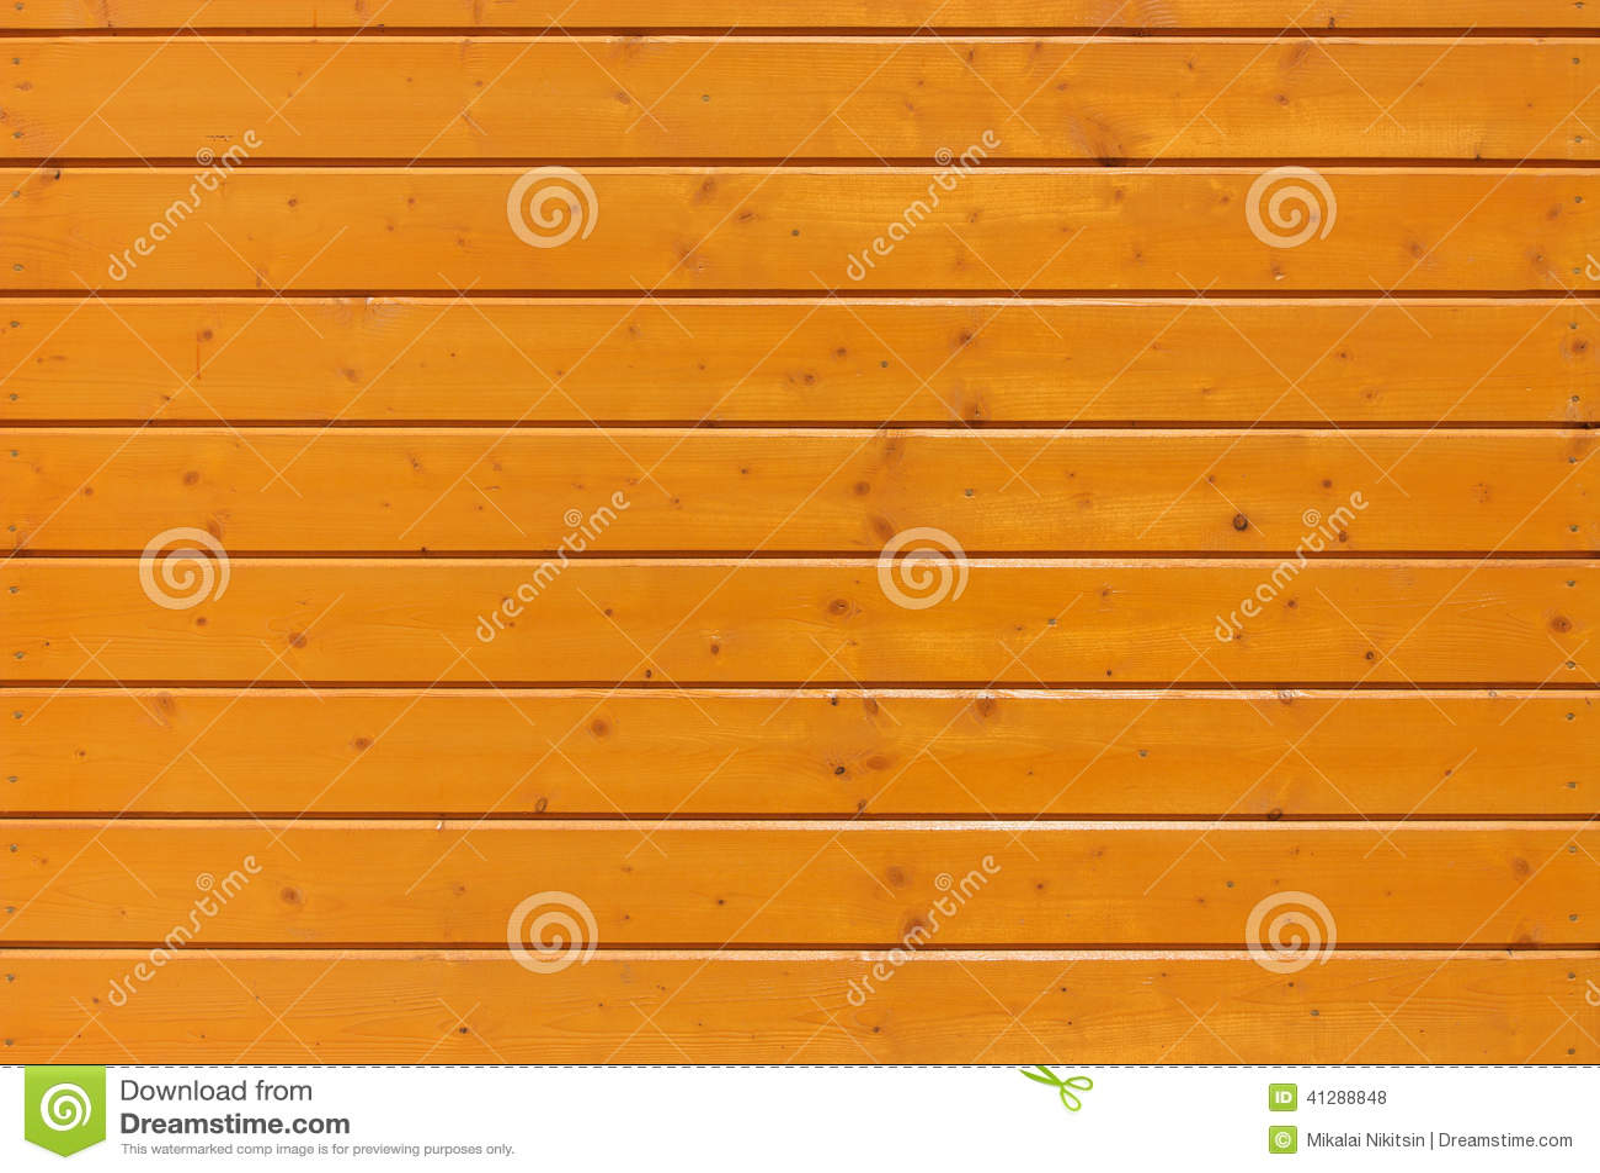 Wood Planks Yellow Wood Planks